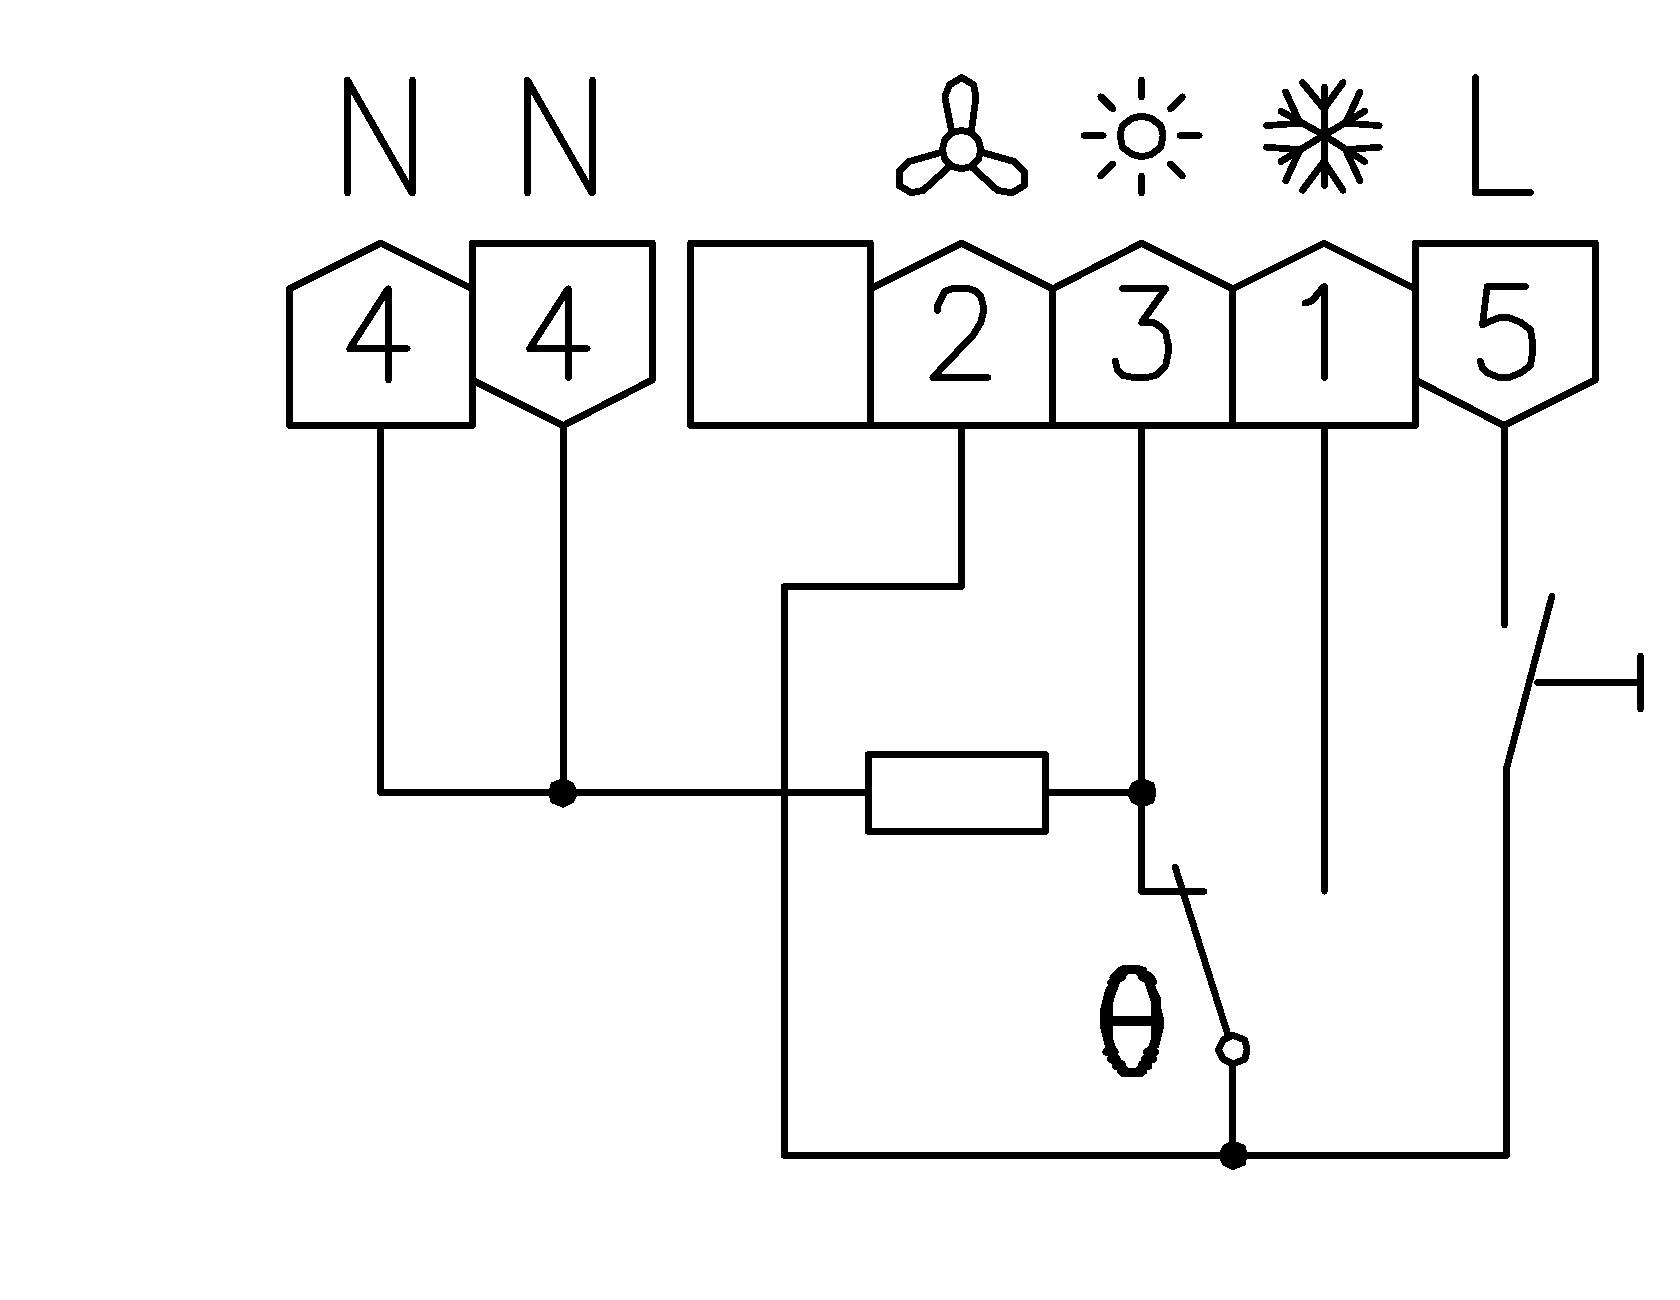 MA010900 Circuit diagram